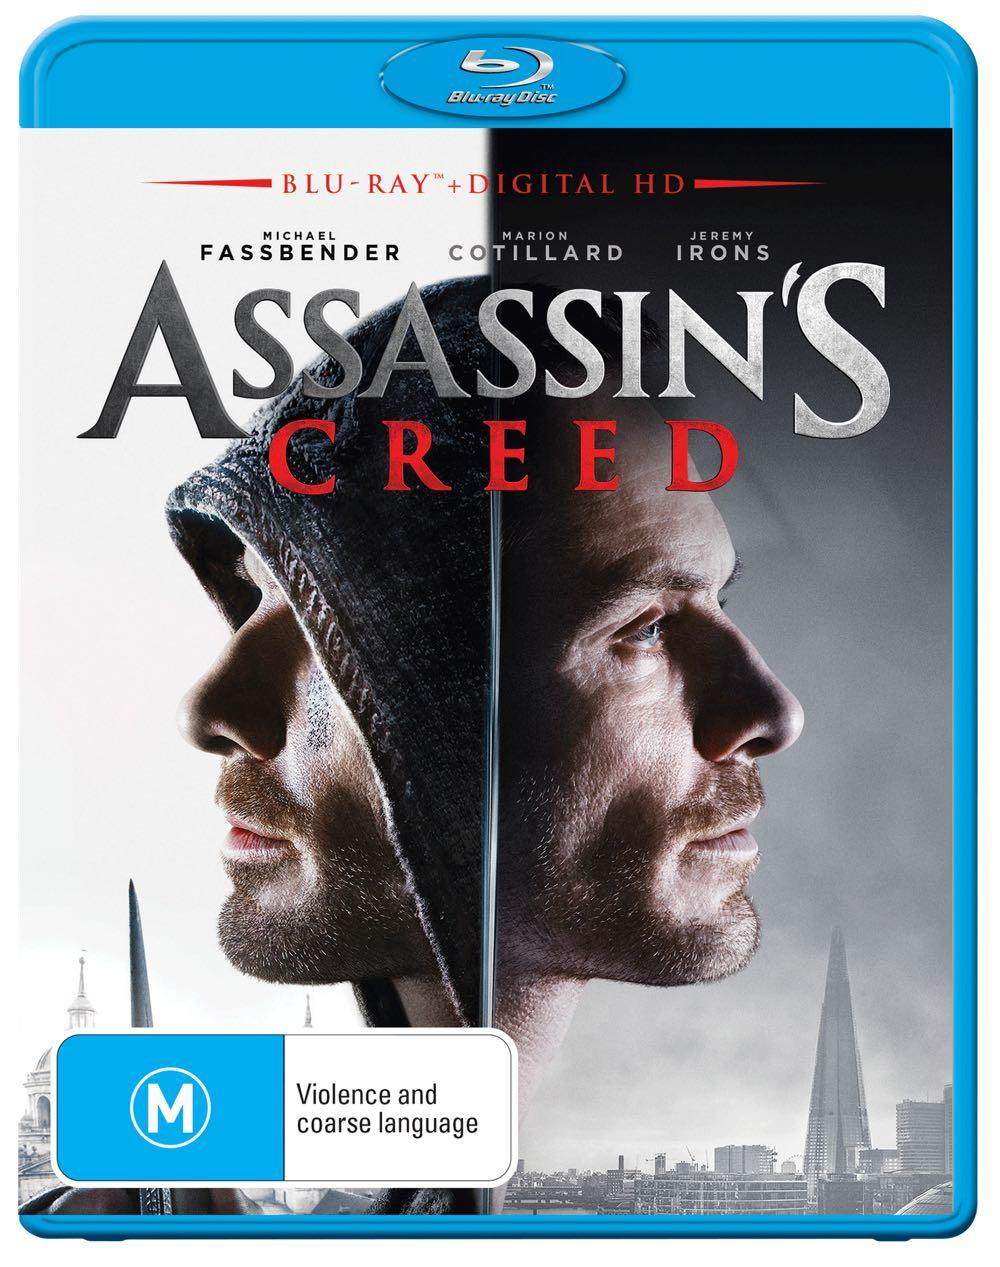 assassinscreed7